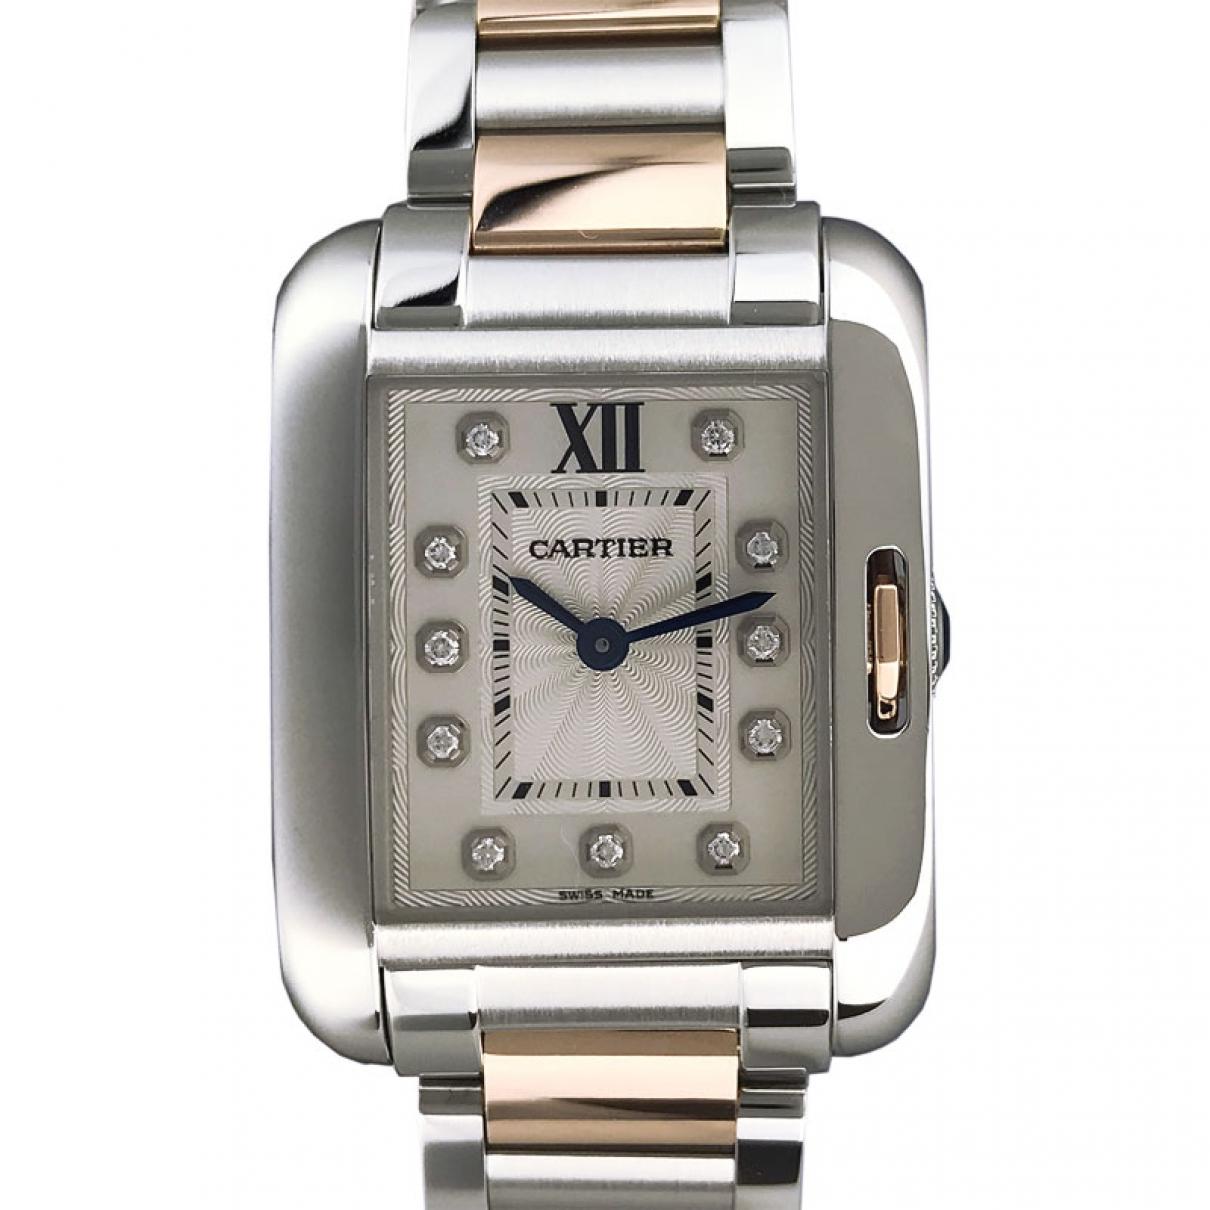 Cartier Tank Anglaise Uhr in  Silber Gold und Stahl